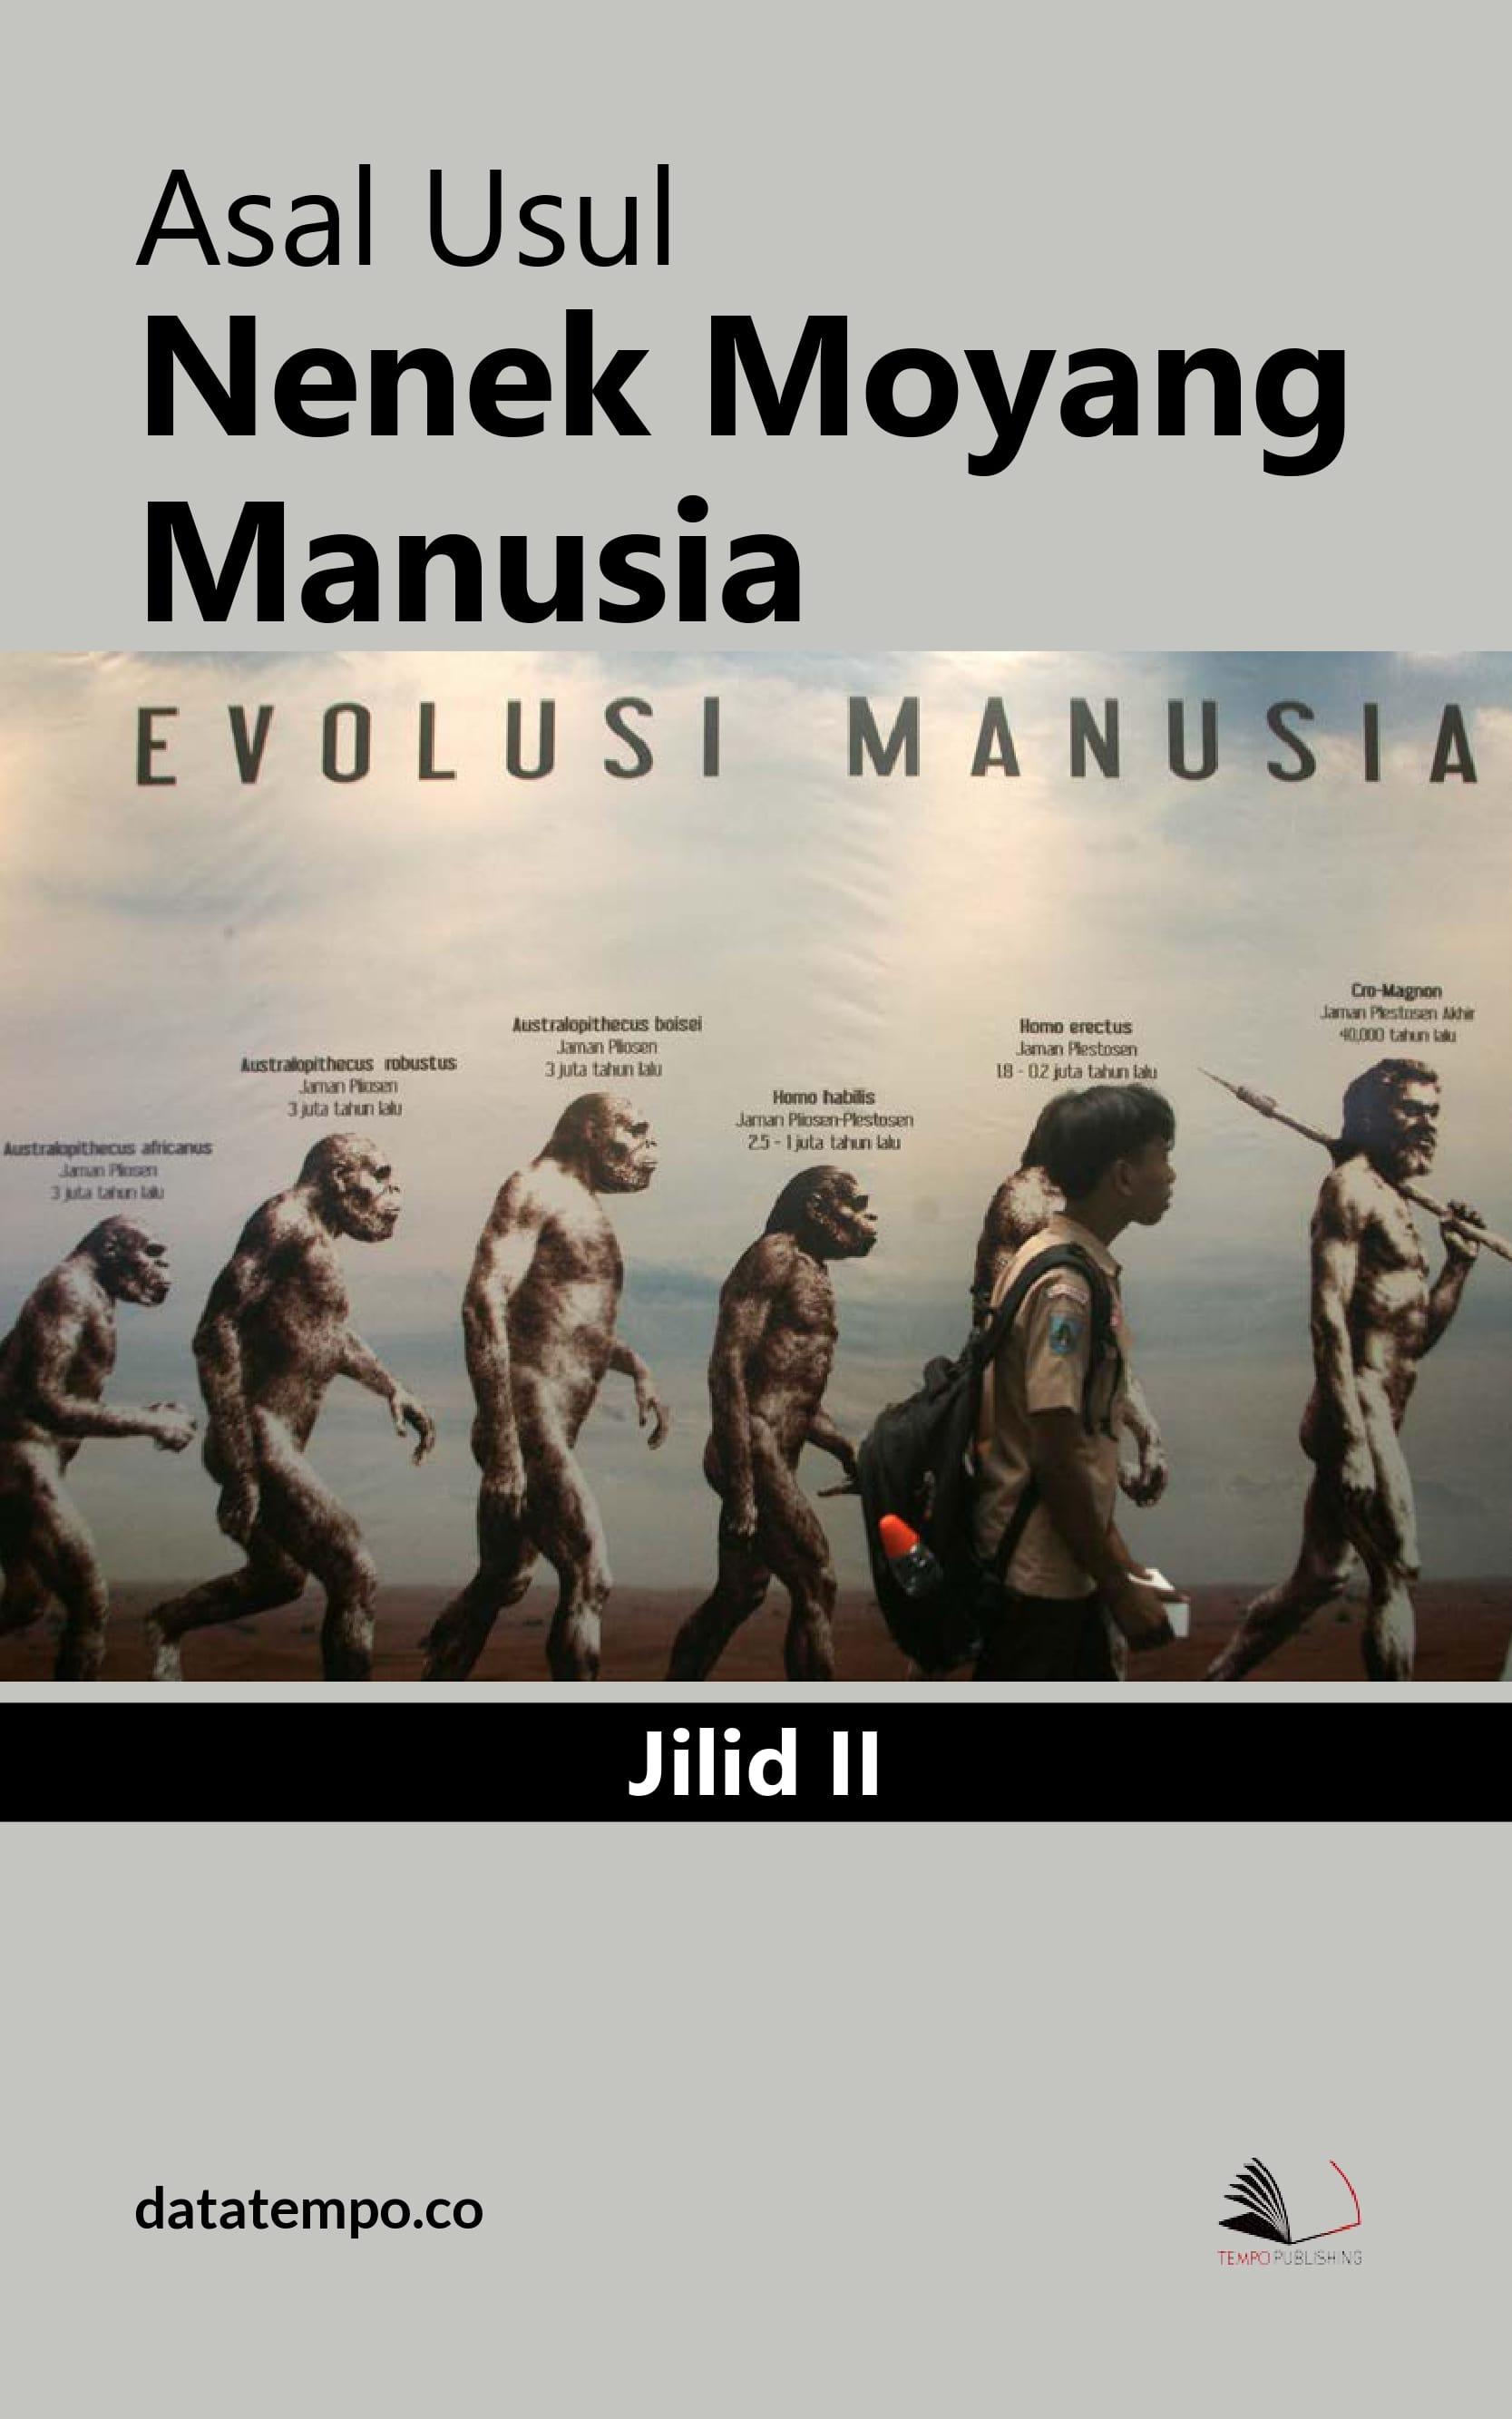 Asal usul nenek moyang manusia jilid ii [sumber elektronis]